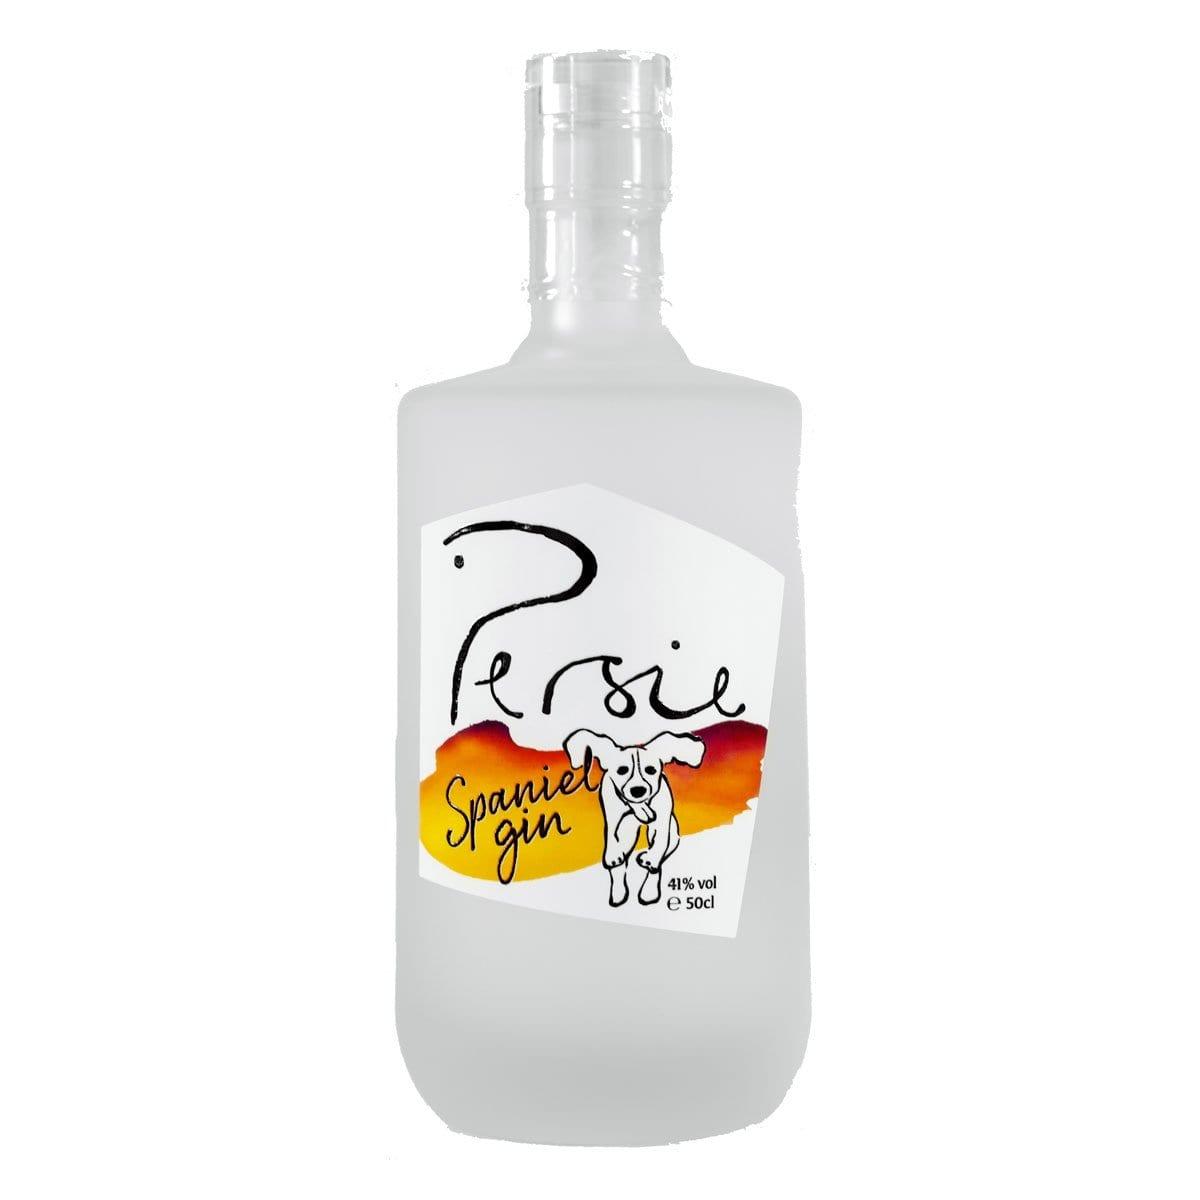 Persie Spaniel Gin